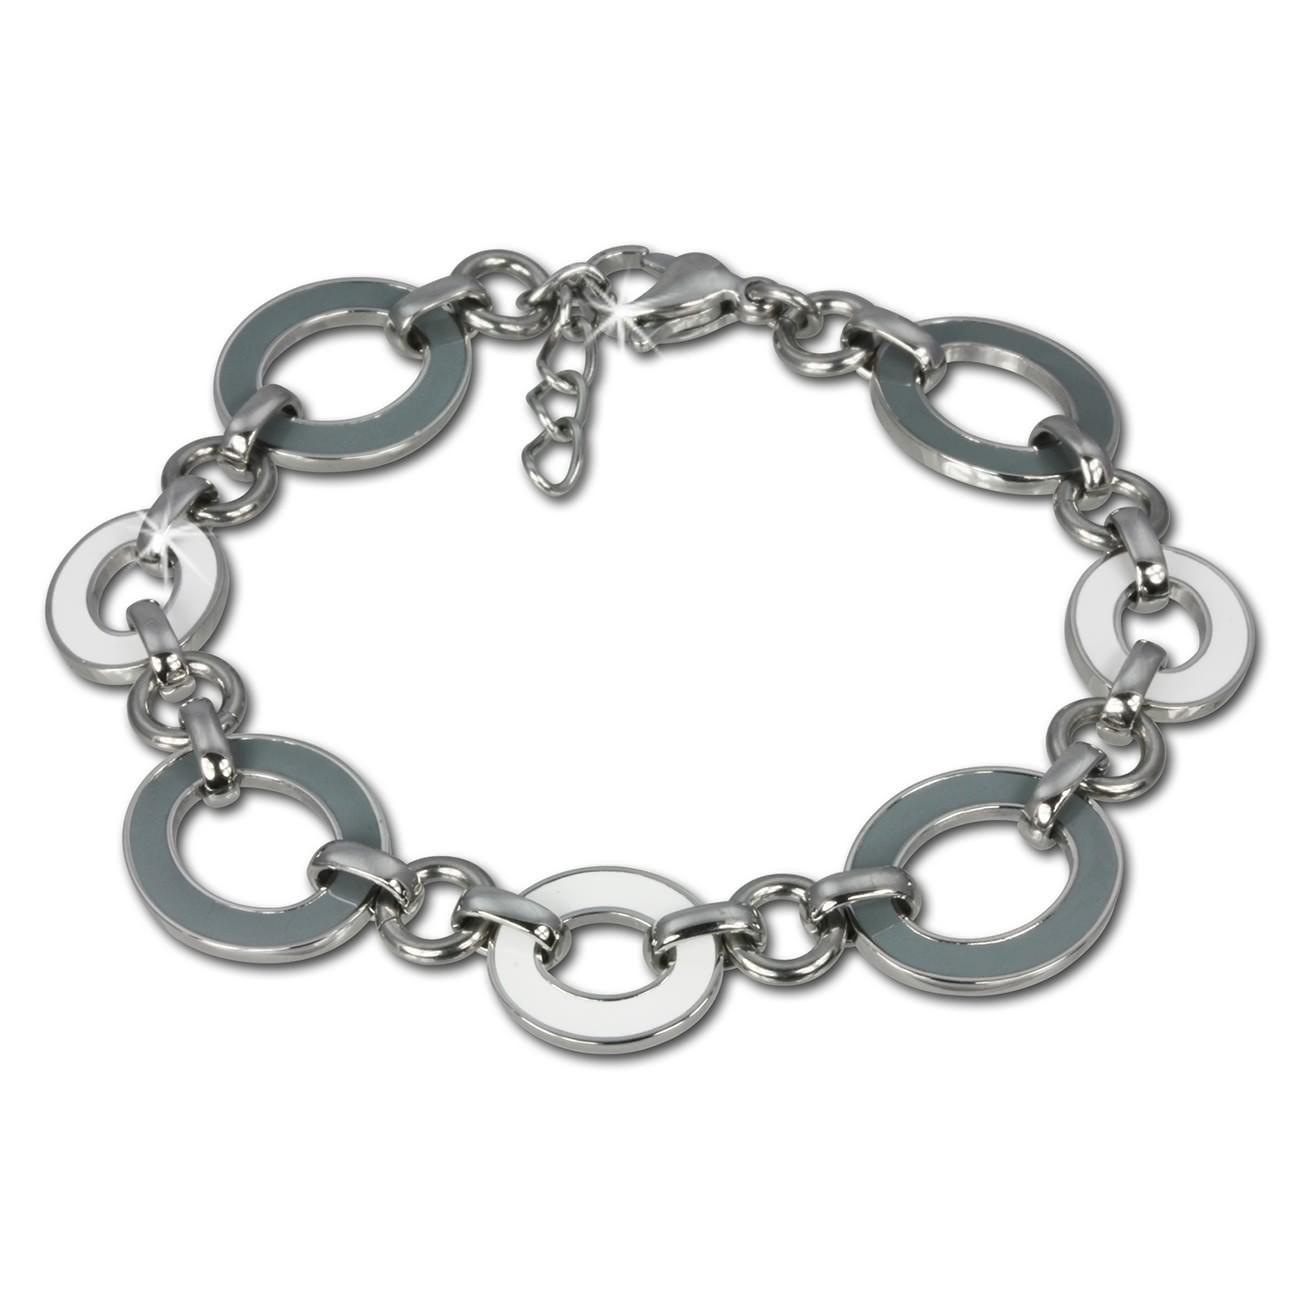 Amello Armband Oval Emaille grau/weiß Damen Edelstahlschmuck ESAG01K